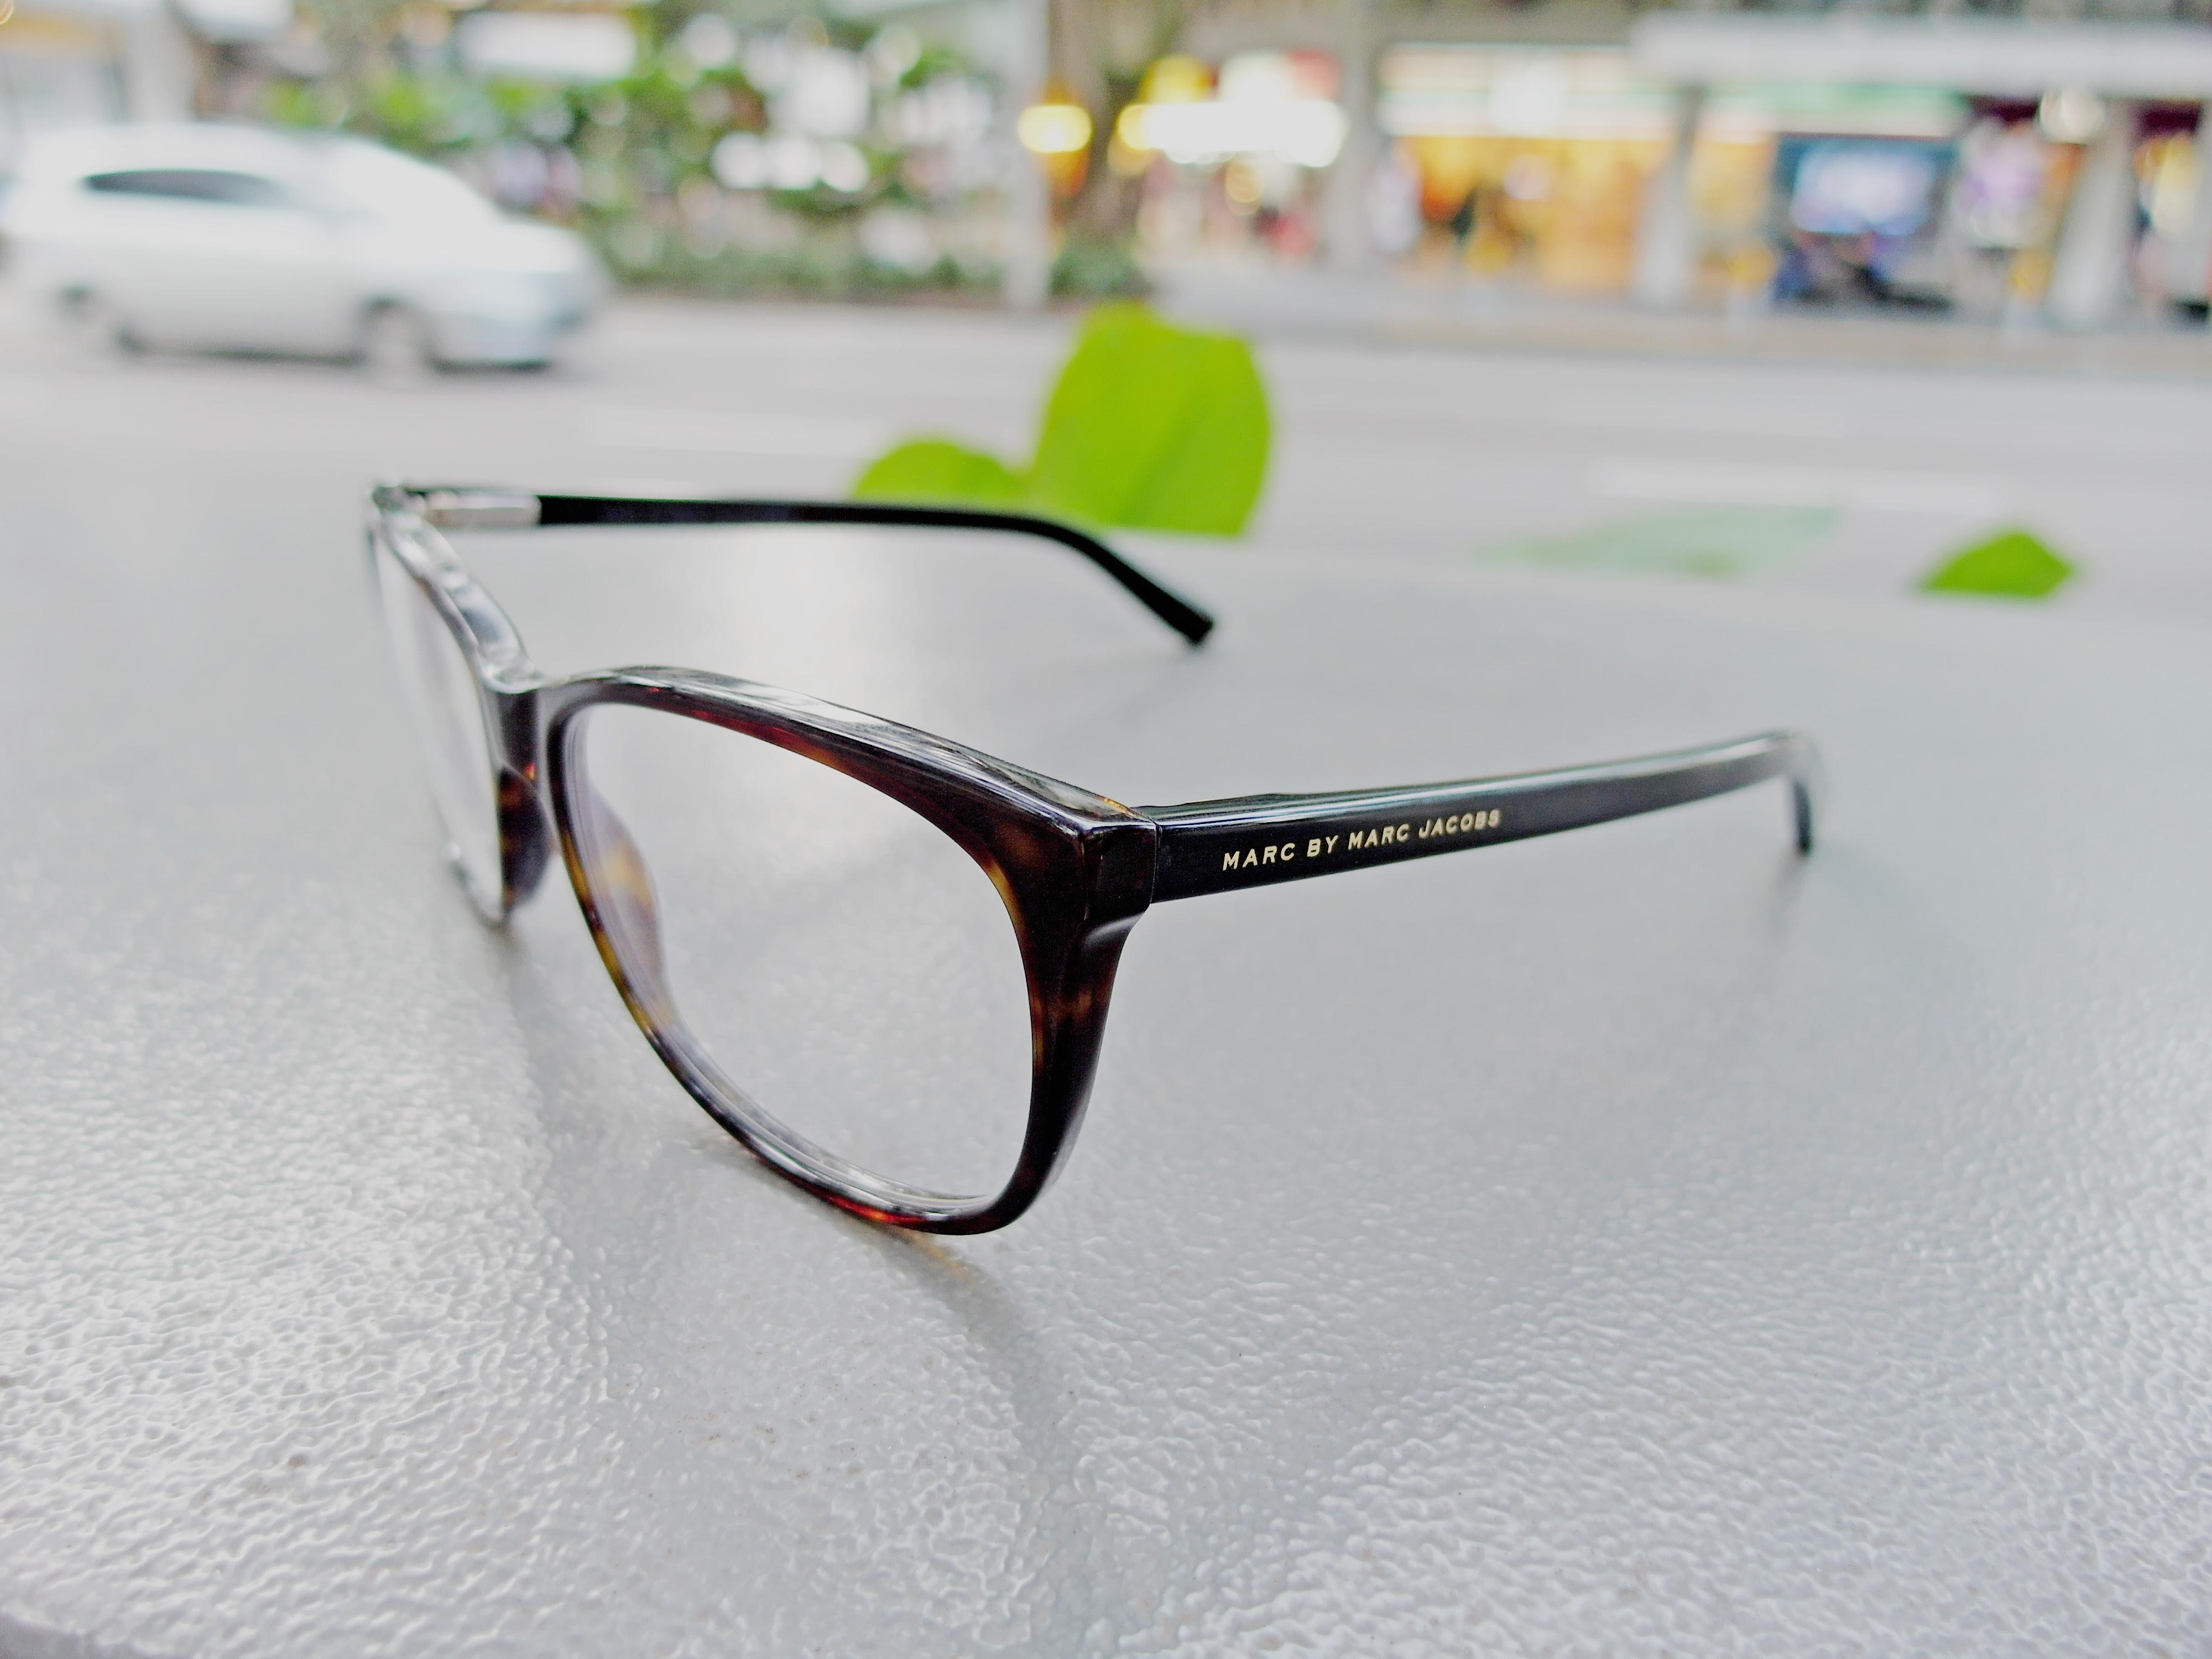 marc jacobs specs 2